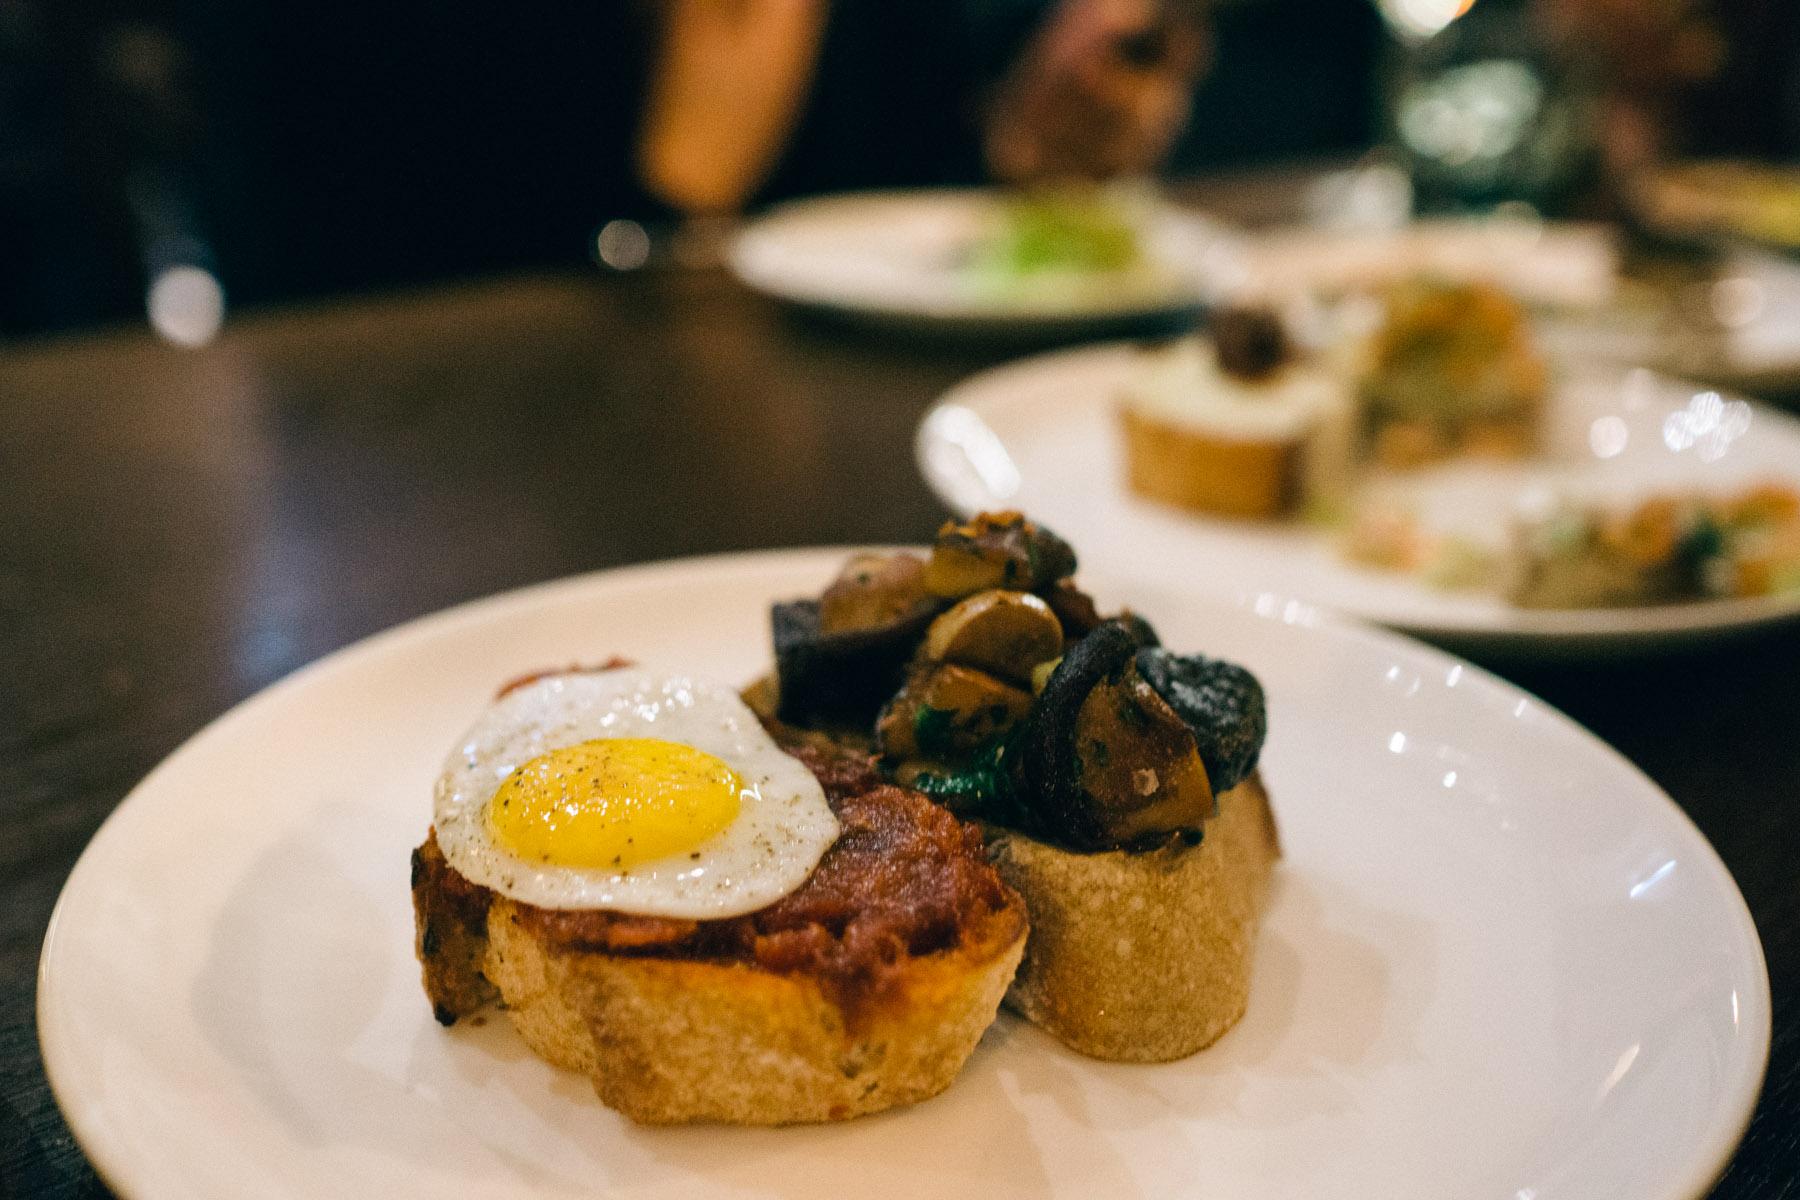 ham-and-sherry-spanish-tapas-ship-street-wan-chai-hong-kong-jason-atherton-21